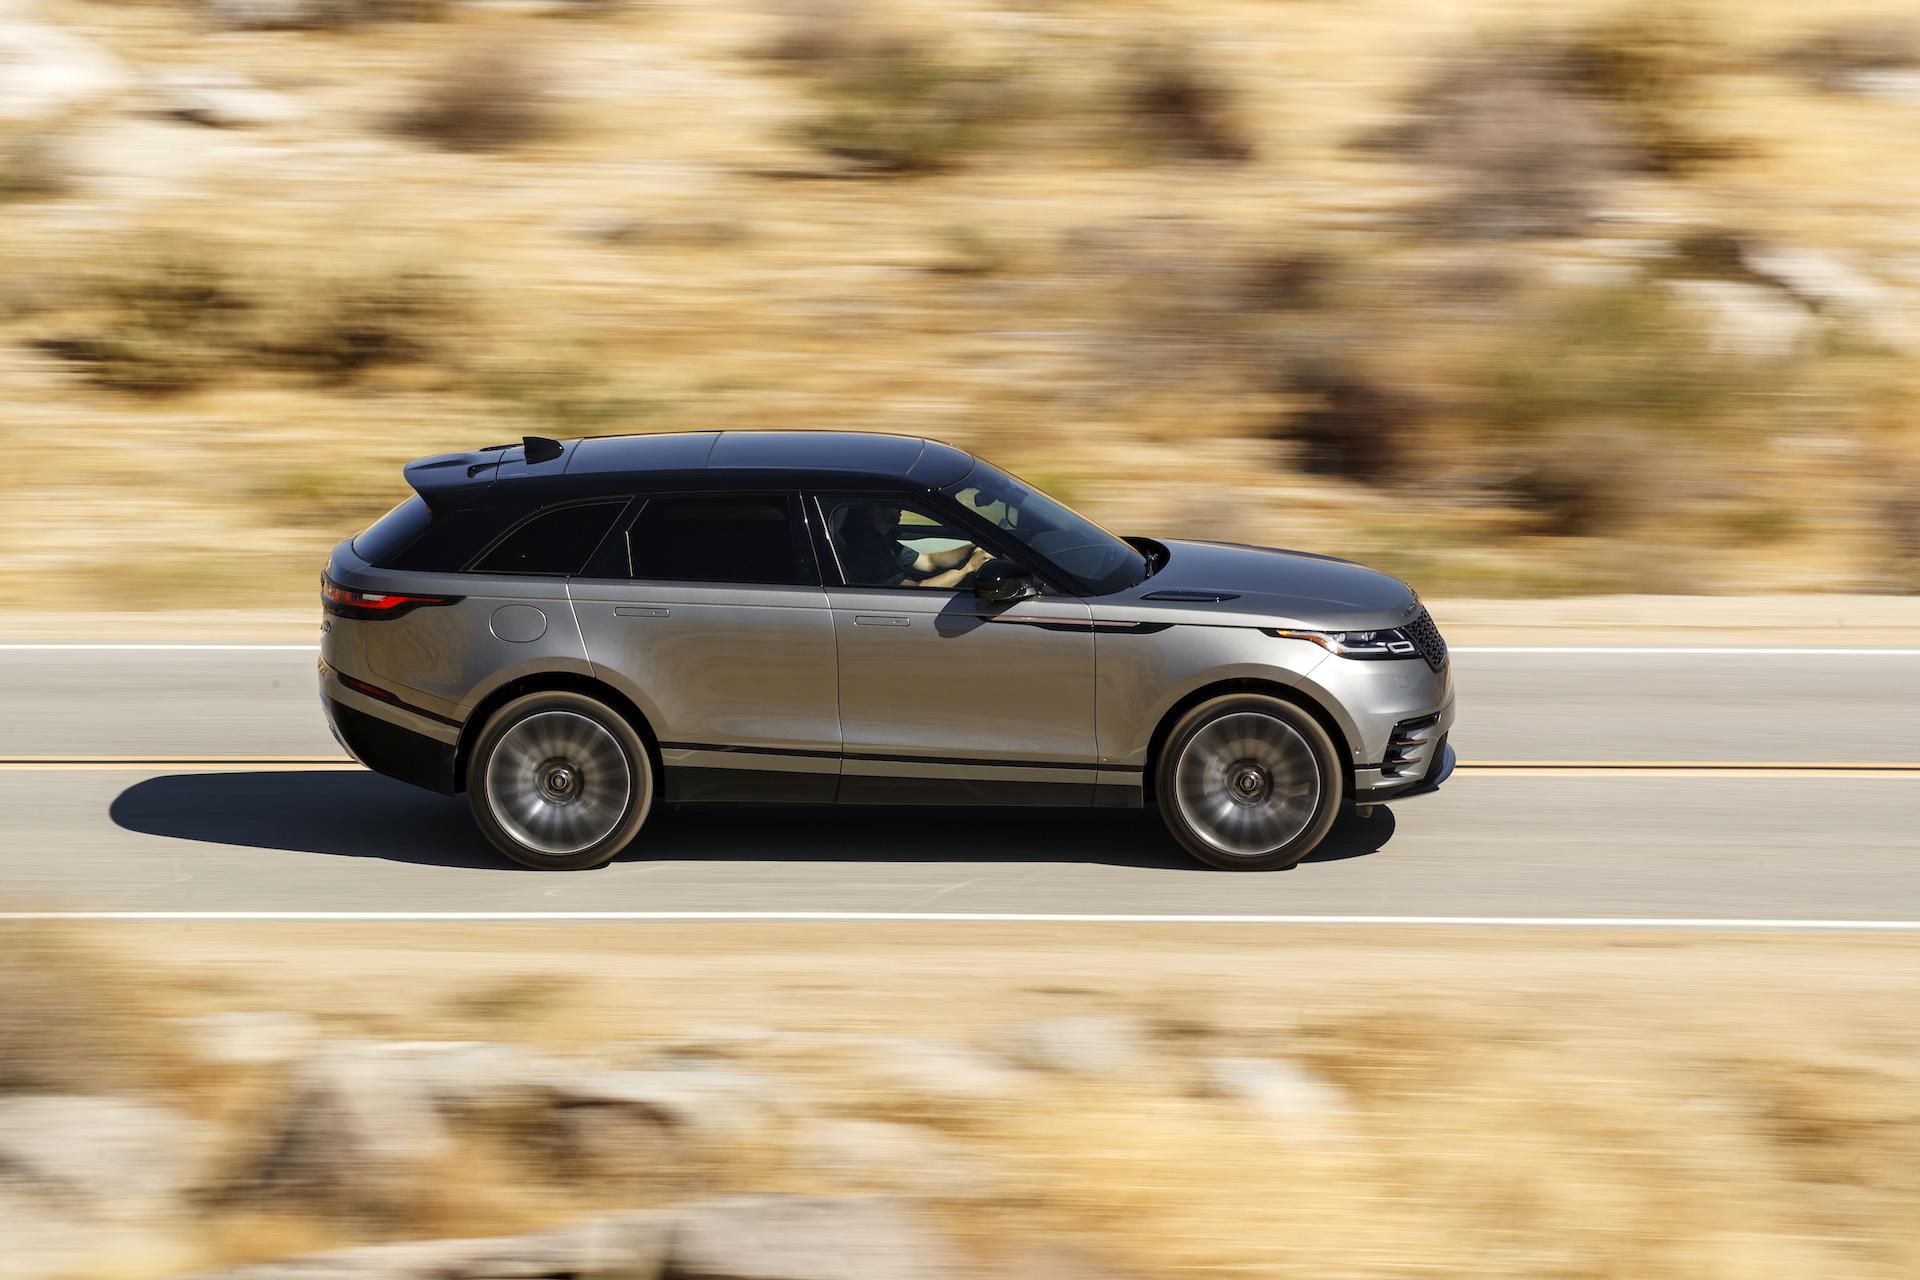 2018 Range Rover Velar: Specs, Design, Price >> 2020 Land Rover Range Rover Velar Review Ratings Specs